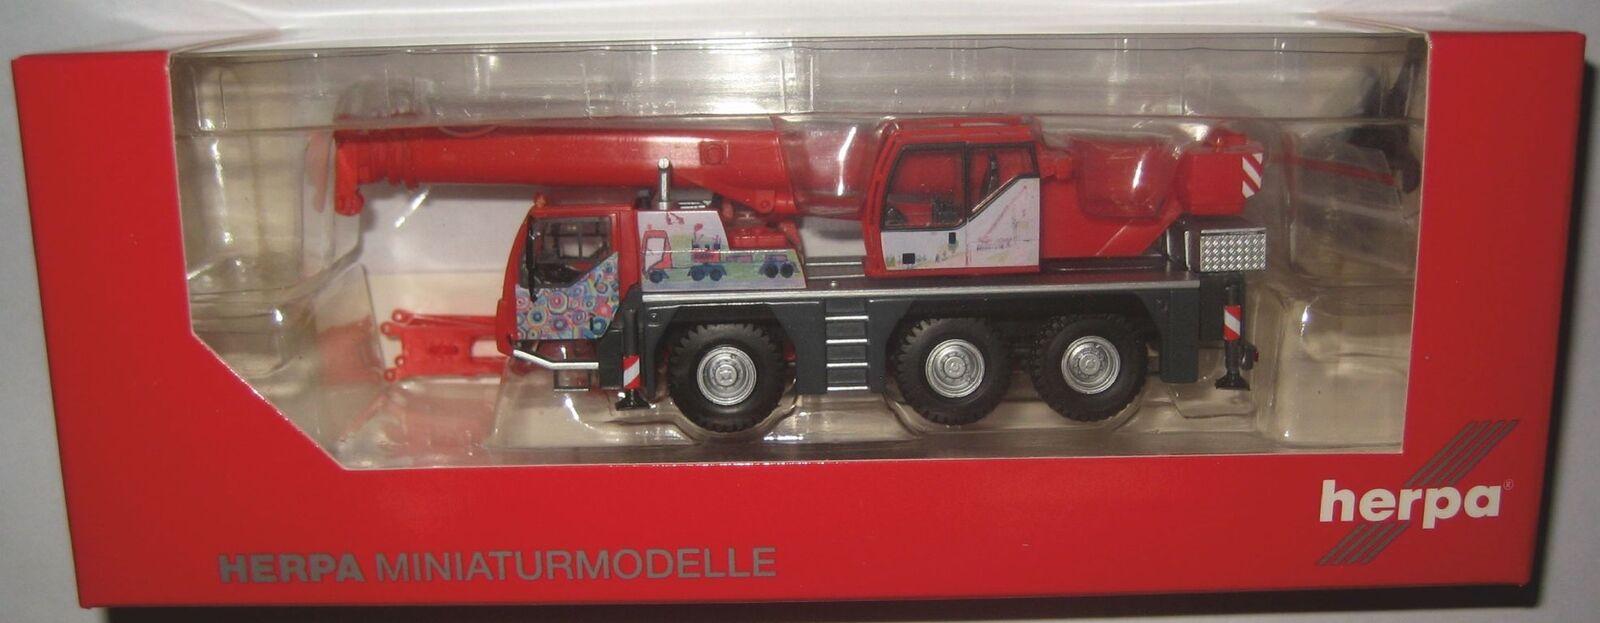 Herpa 309110 Liebherr LTM 1045 1 grue mobile Scholpp kinderkran 1 87 voie HO